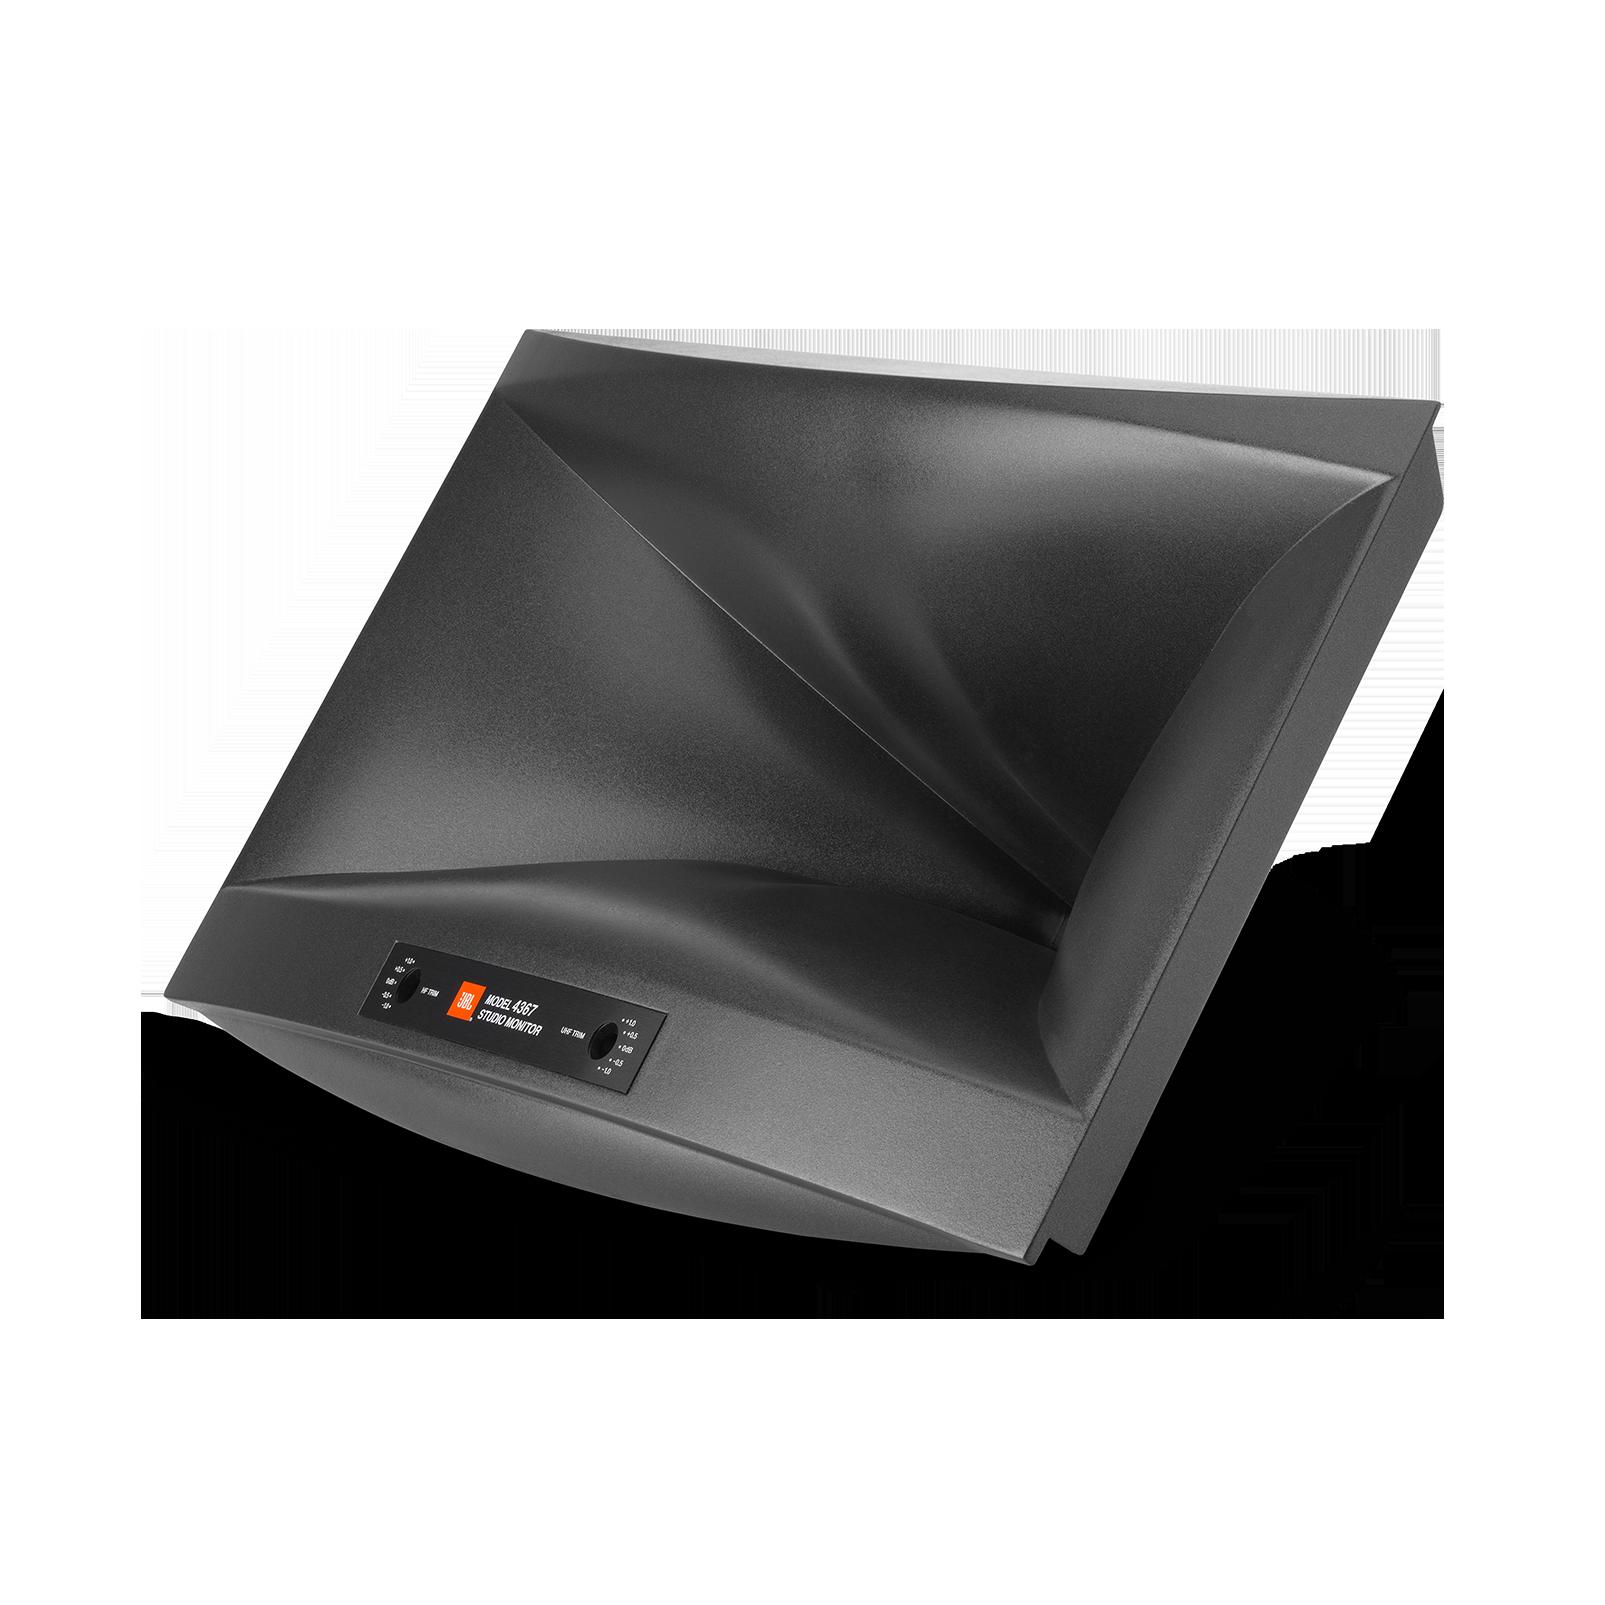 "4367 - Black - 2-way 15"" (380mm) Floorstanding Studio Monitor Loudspeaker - Detailshot 1"